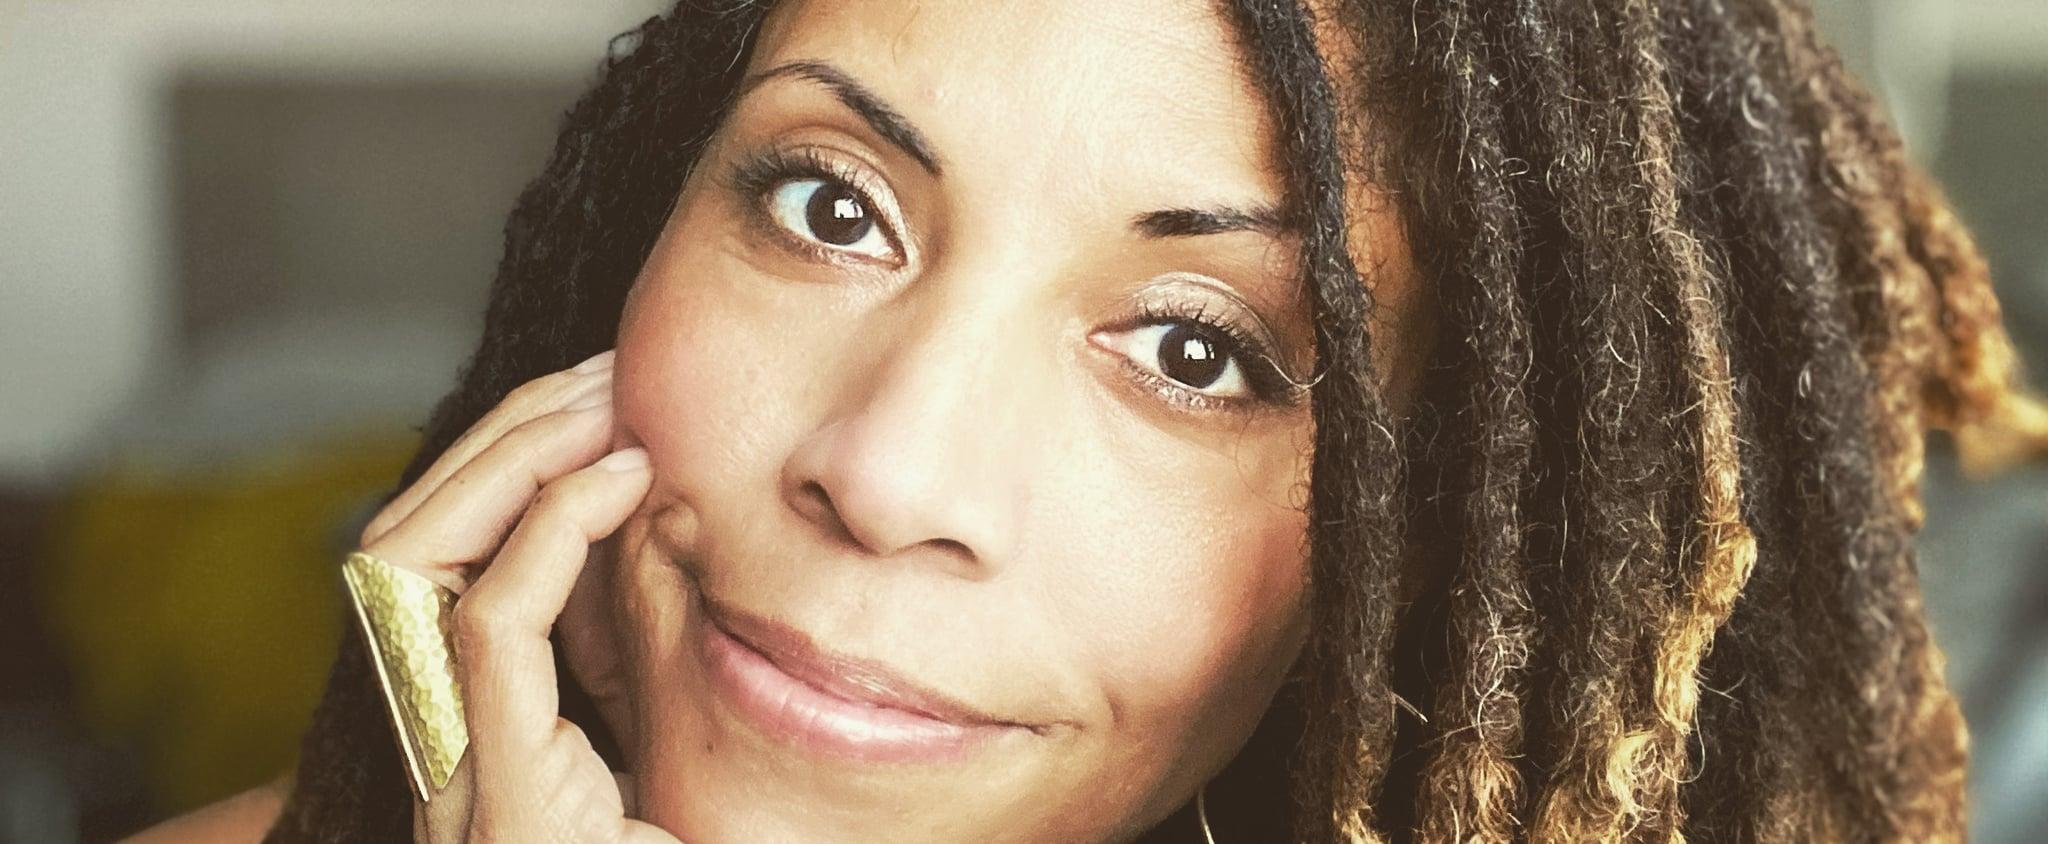 Sensuality Coach Anjua Maximo's Tips For Feeling Confident